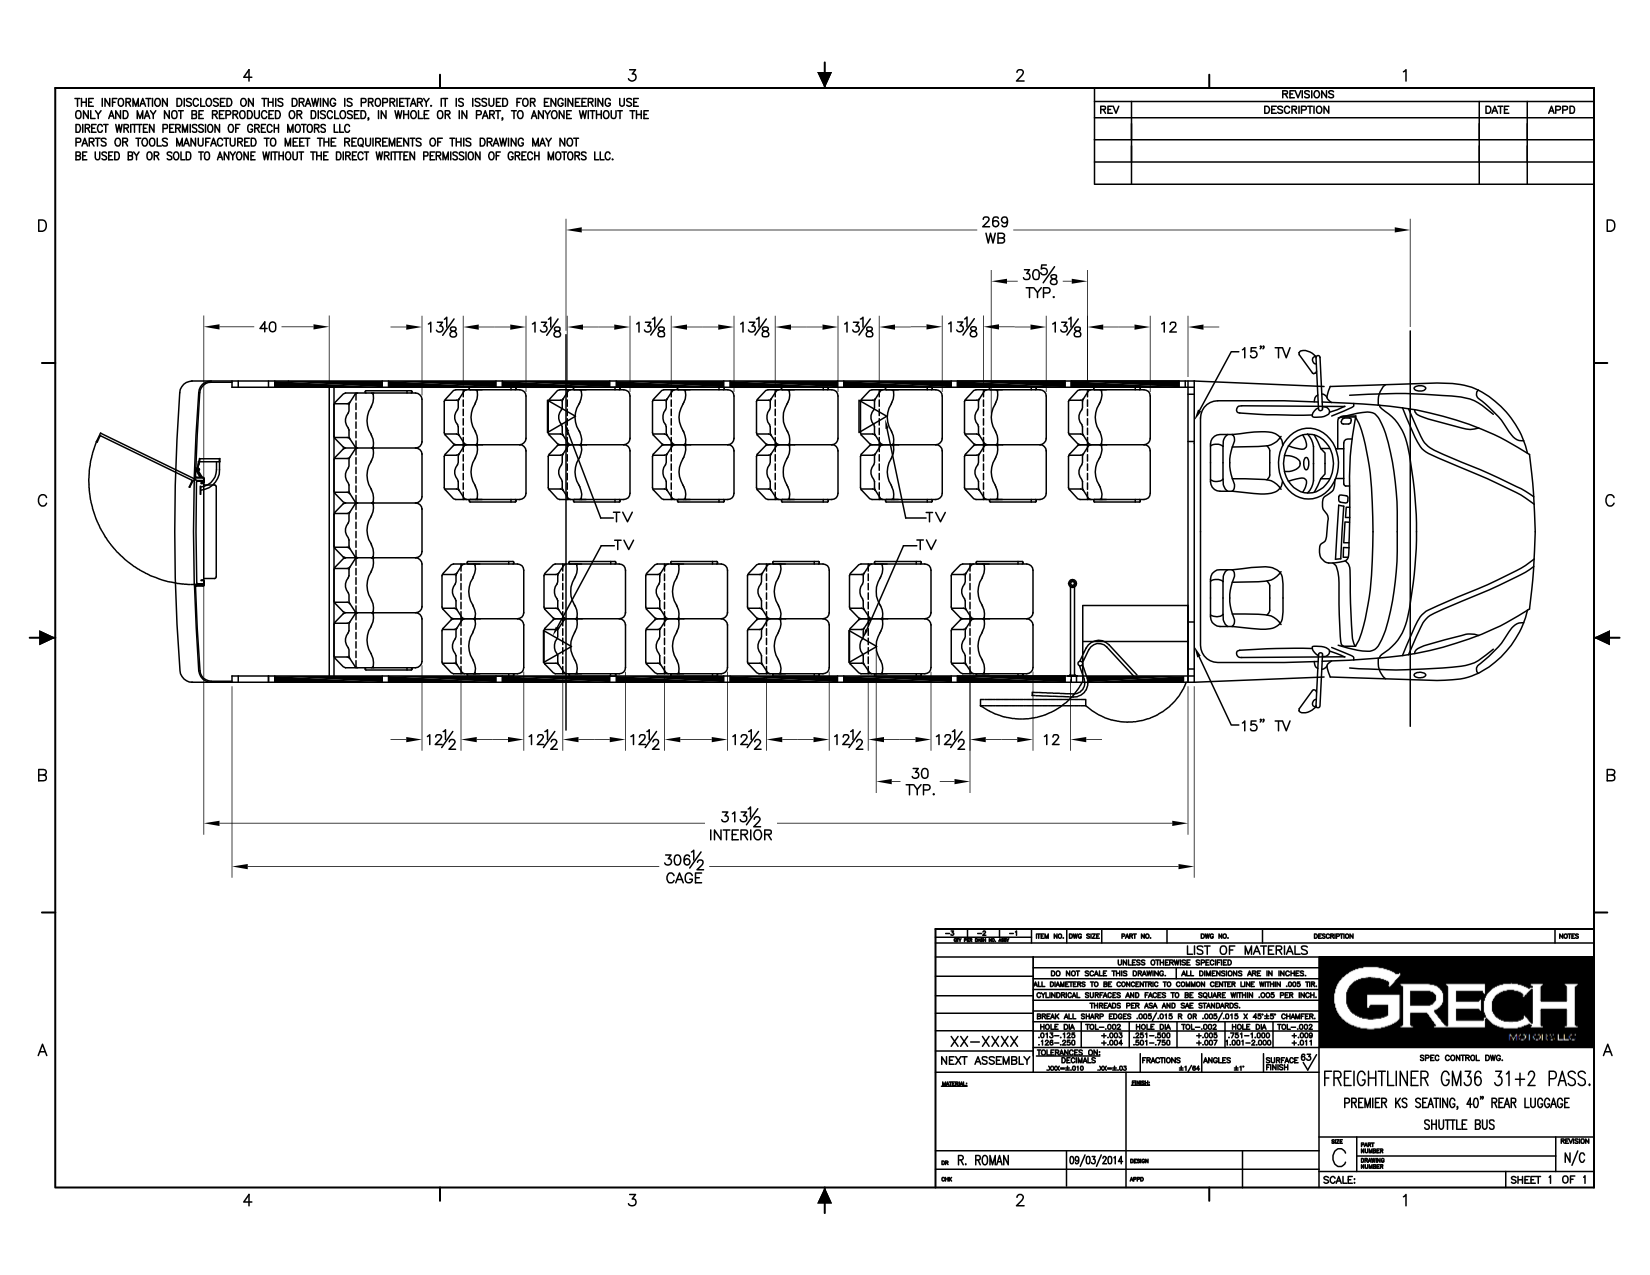 Grech Motors Freightliner Shuttle Bus For Sale GM36Floor Plan